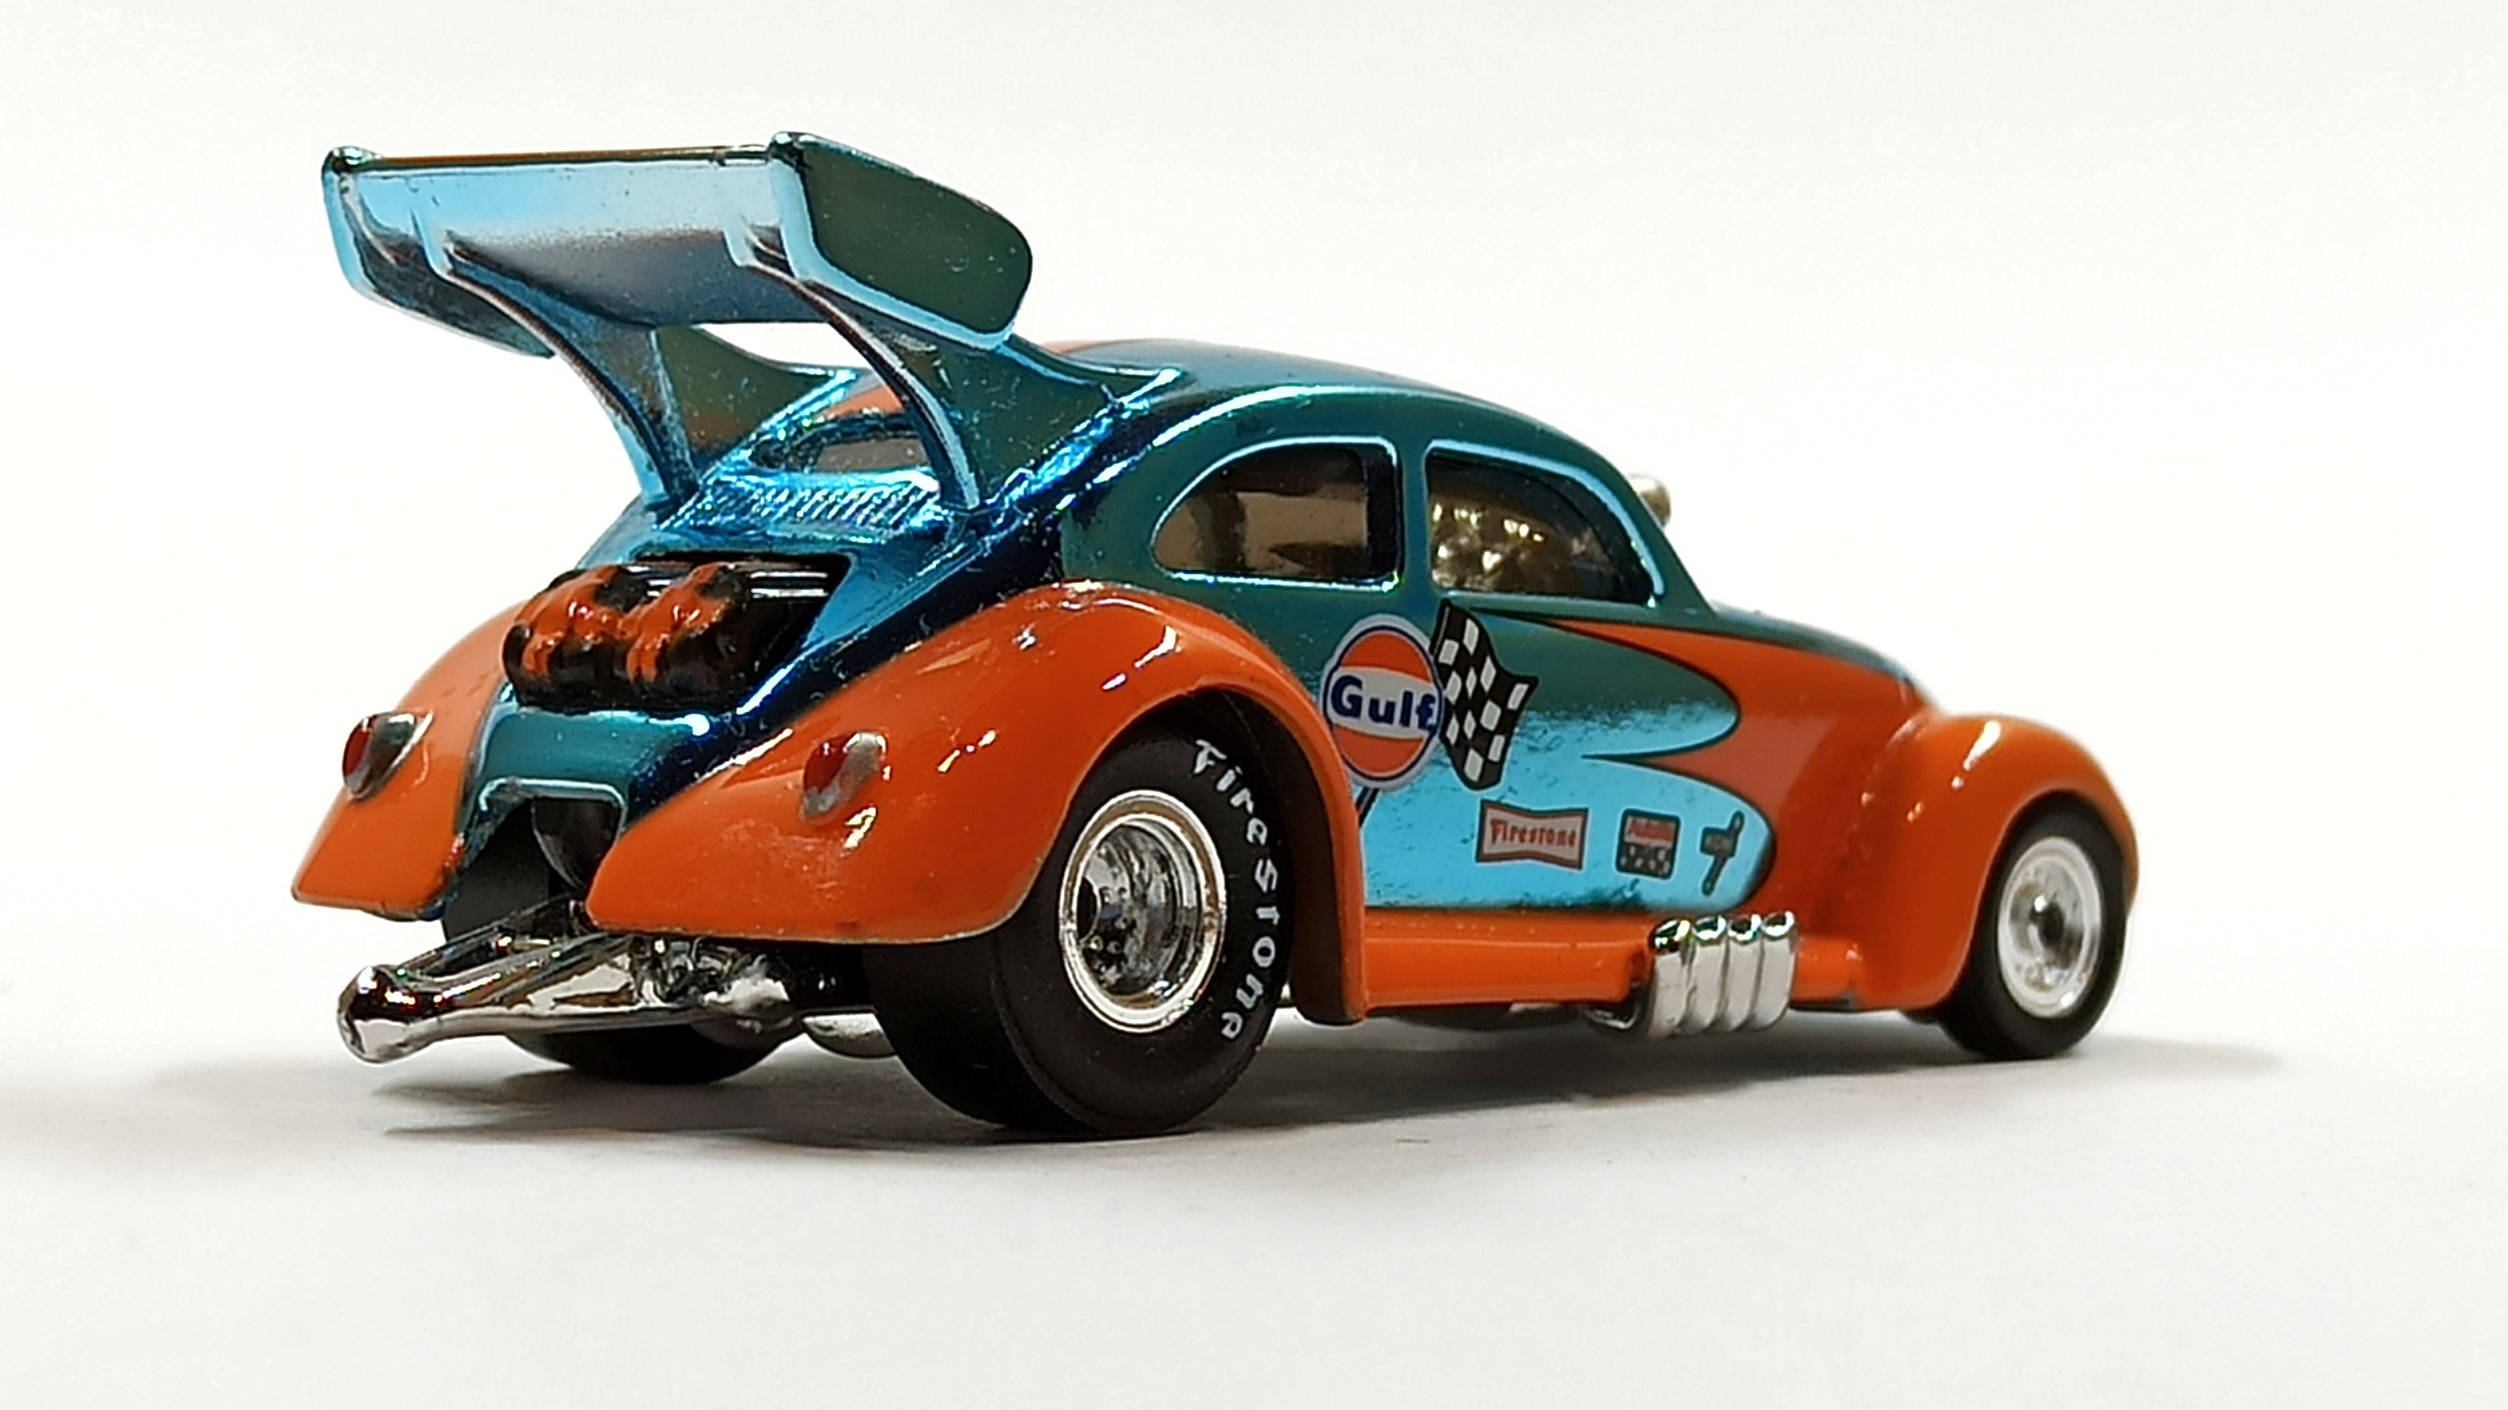 Hot Wheels Custom '56 Volkswagen Drag Beetle (Y0452) 2013 HWC Gulf Racing (3/4) (1 of 4.000) spectraflame light blue (Gulf) side angle